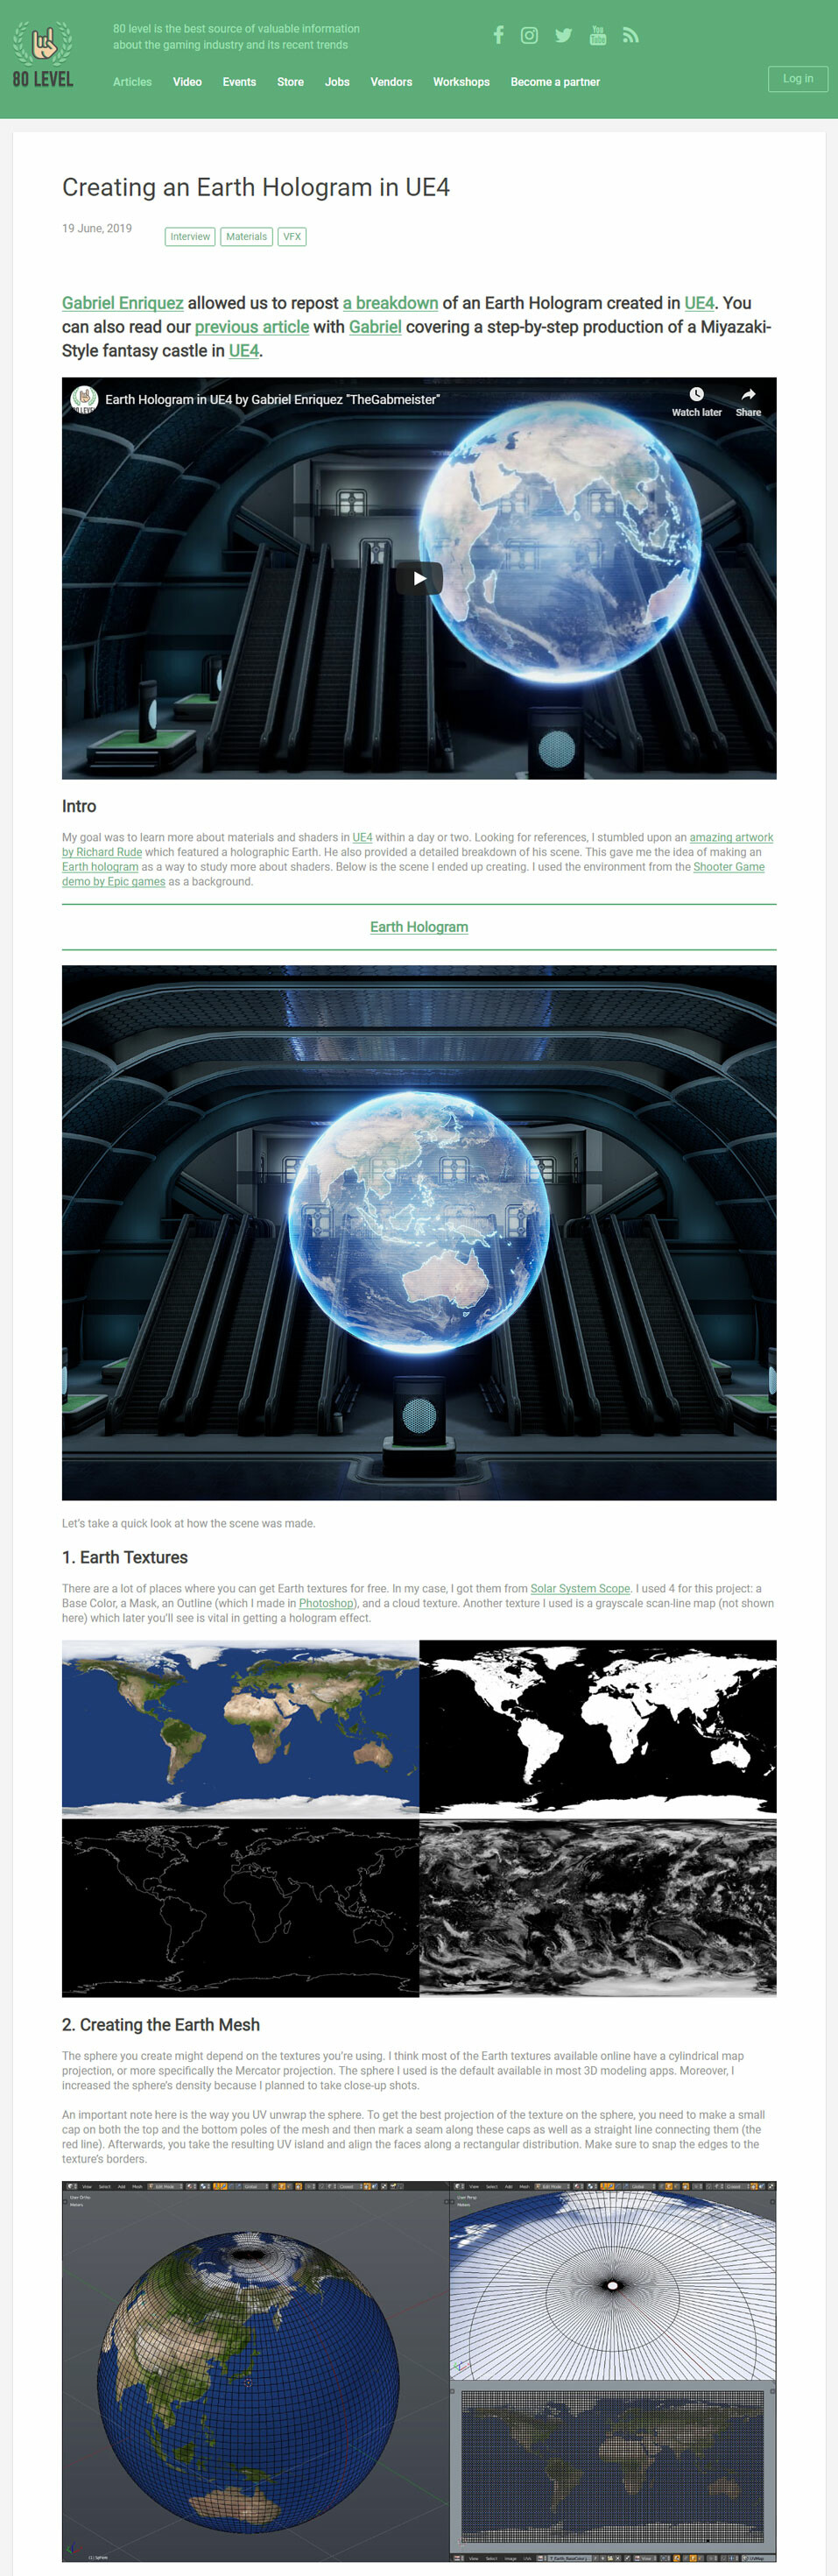 ArtStation - 80 Level Interview - Creating an Earth Hologram